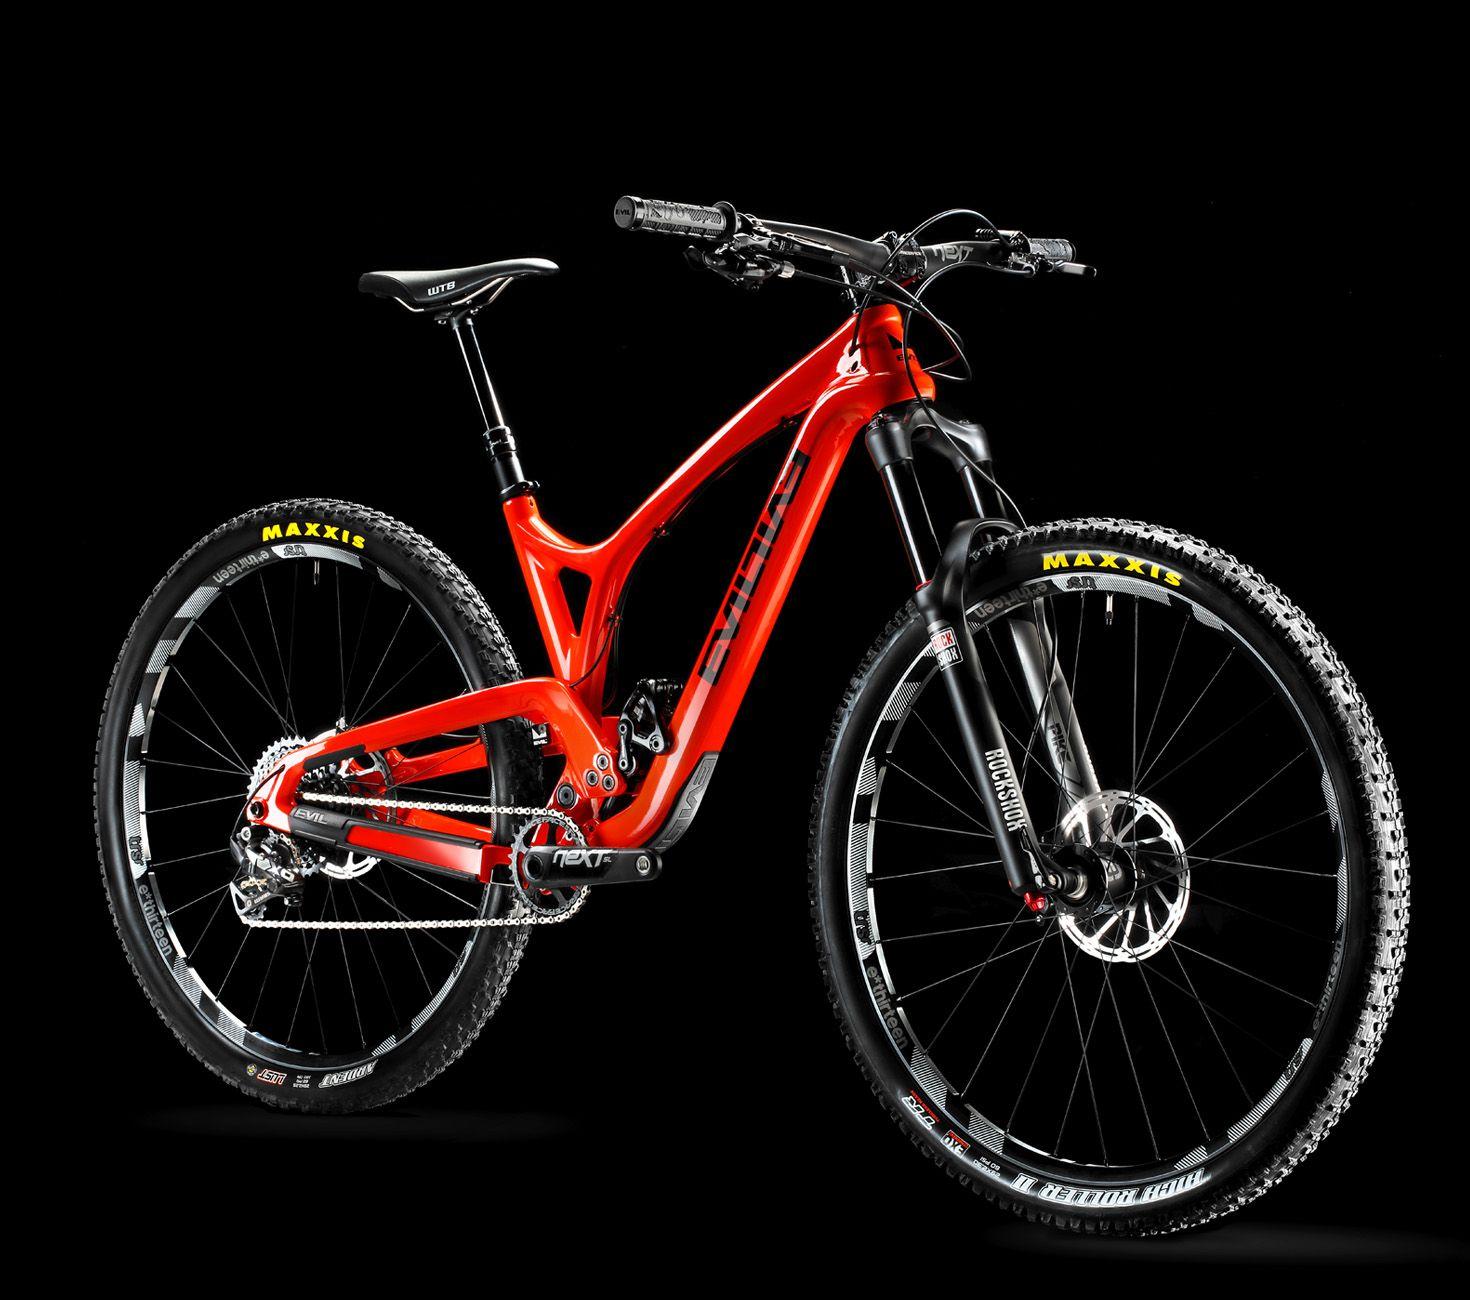 Mmmmmmaybe My N 1 Bike The Following X1 1470x1300 Orange Bmx